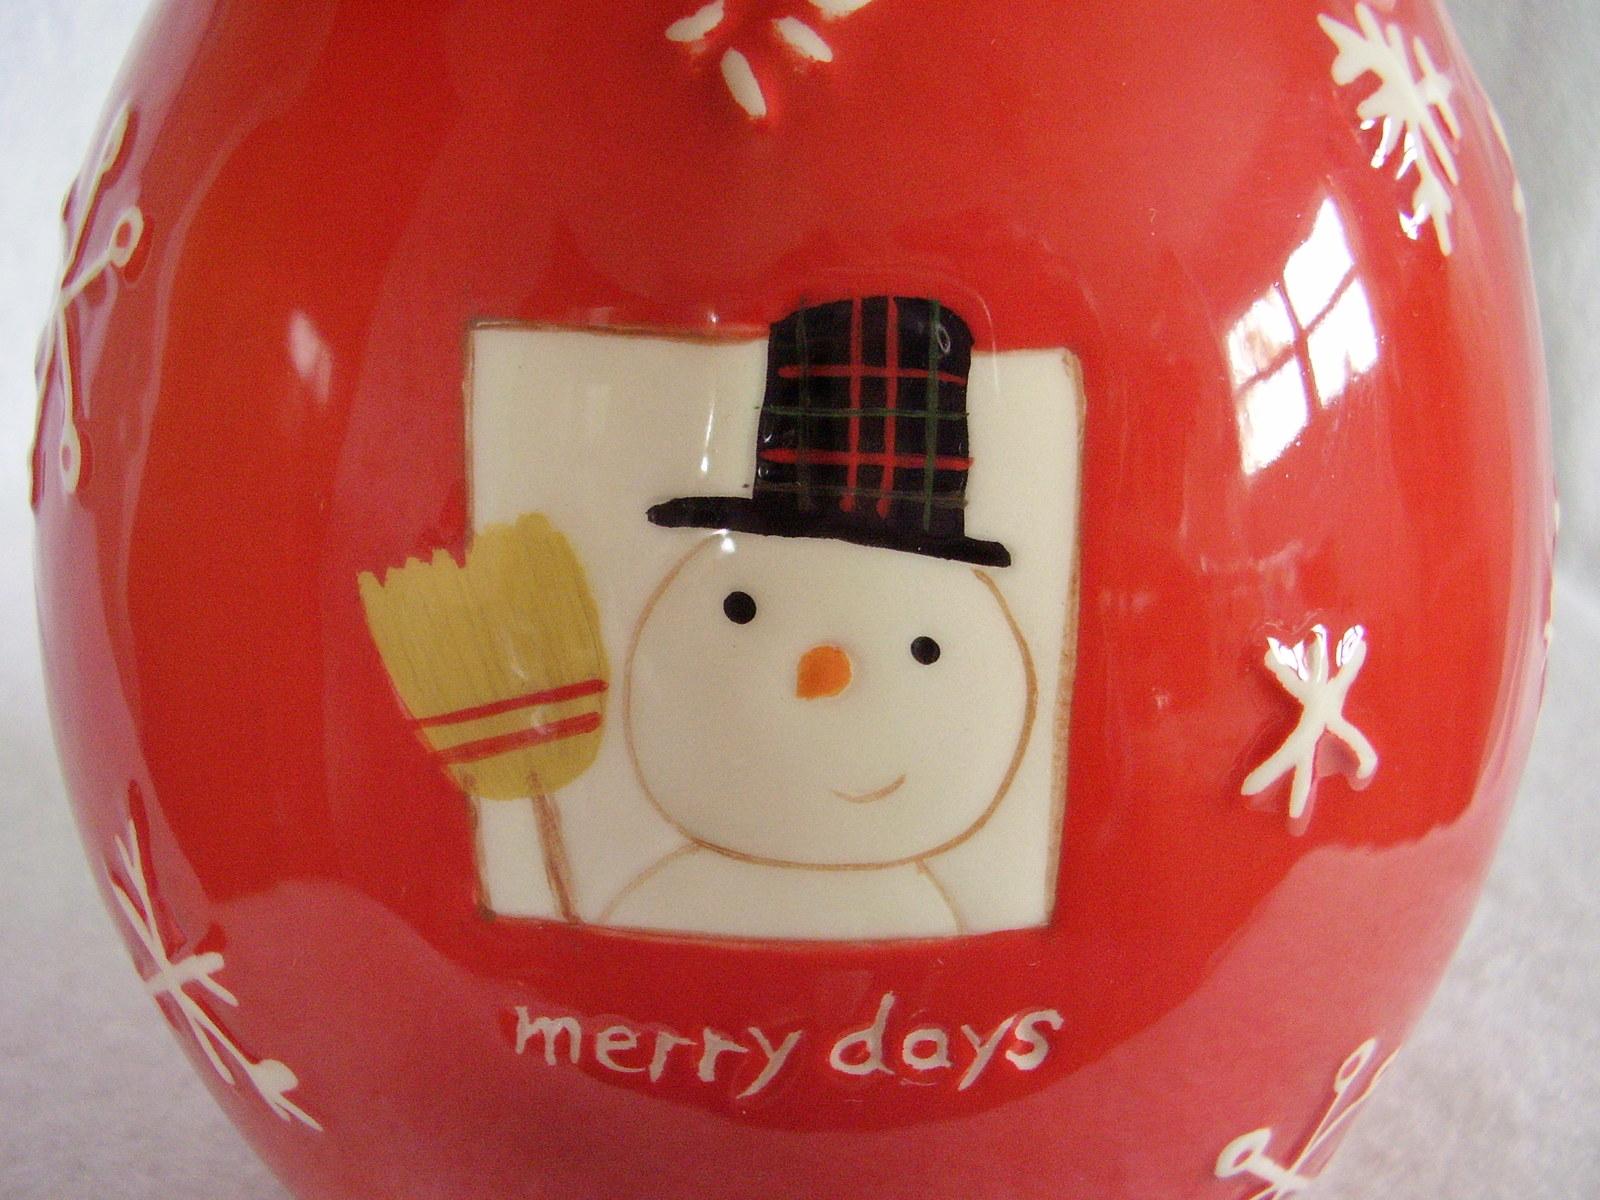 Hallmark Christmas Cookie Treat Jar Merry Days Snowman Snowflakes Jingle Bell image 5